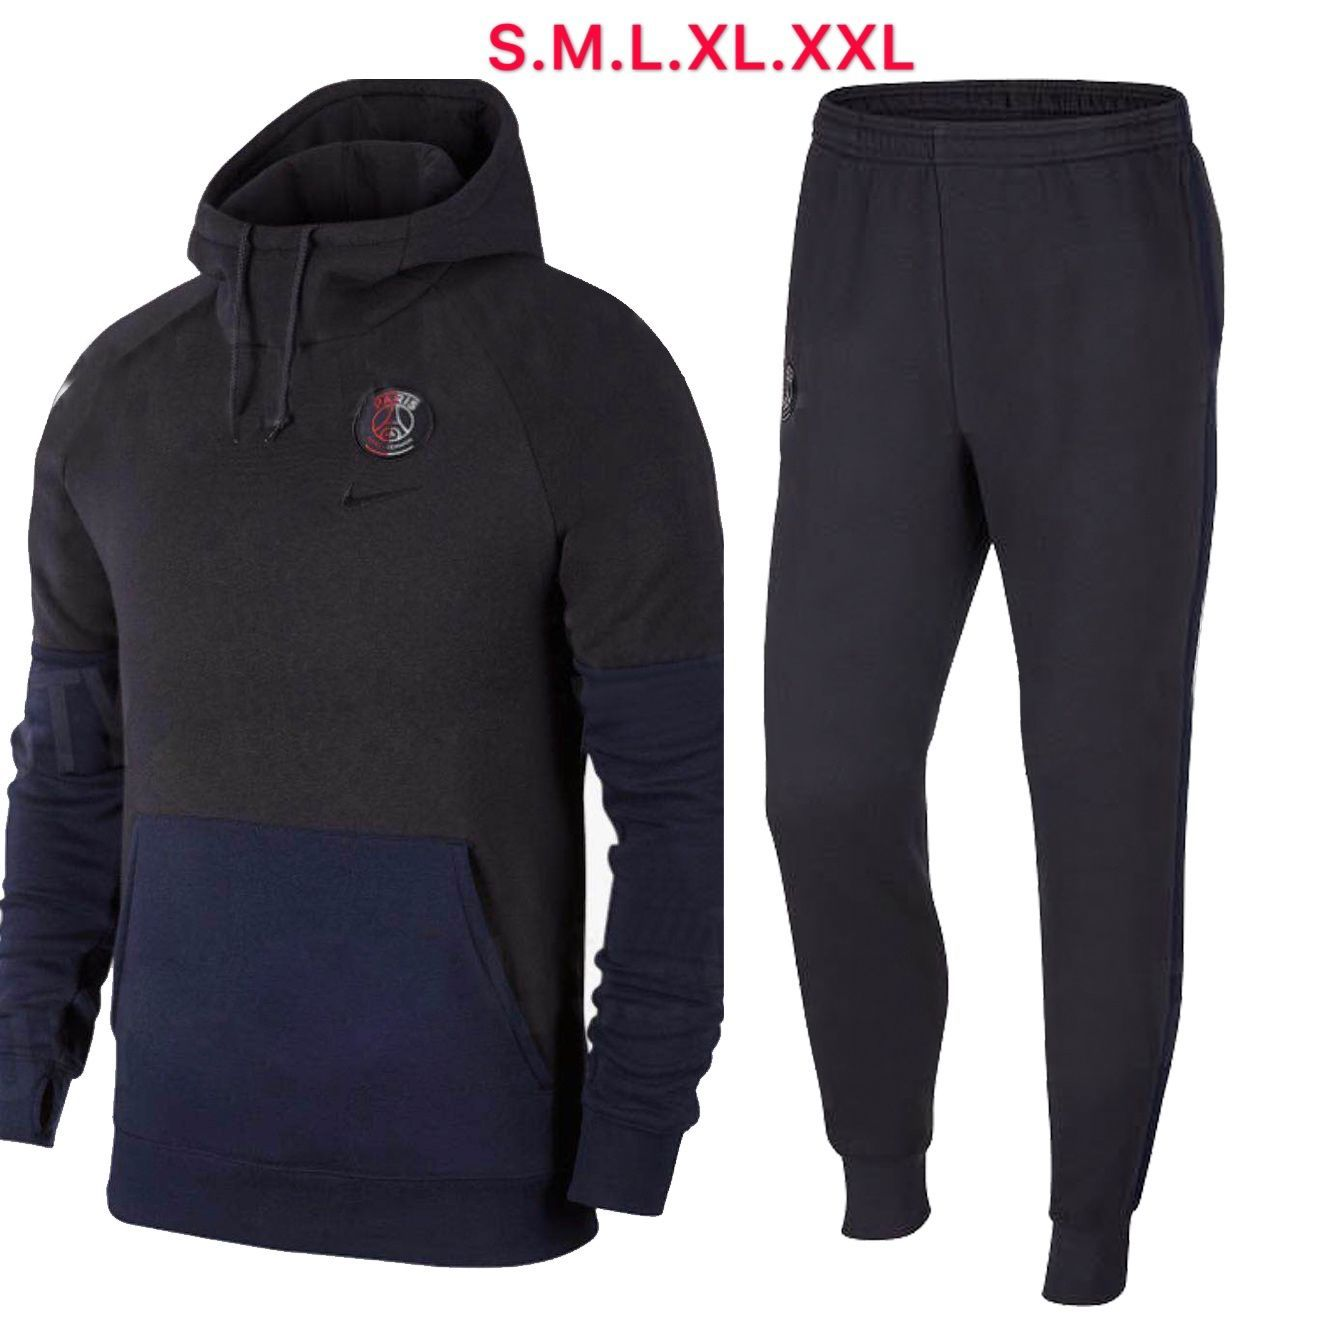 1920 men psg hoodies jacket soccerfootball uniformskits